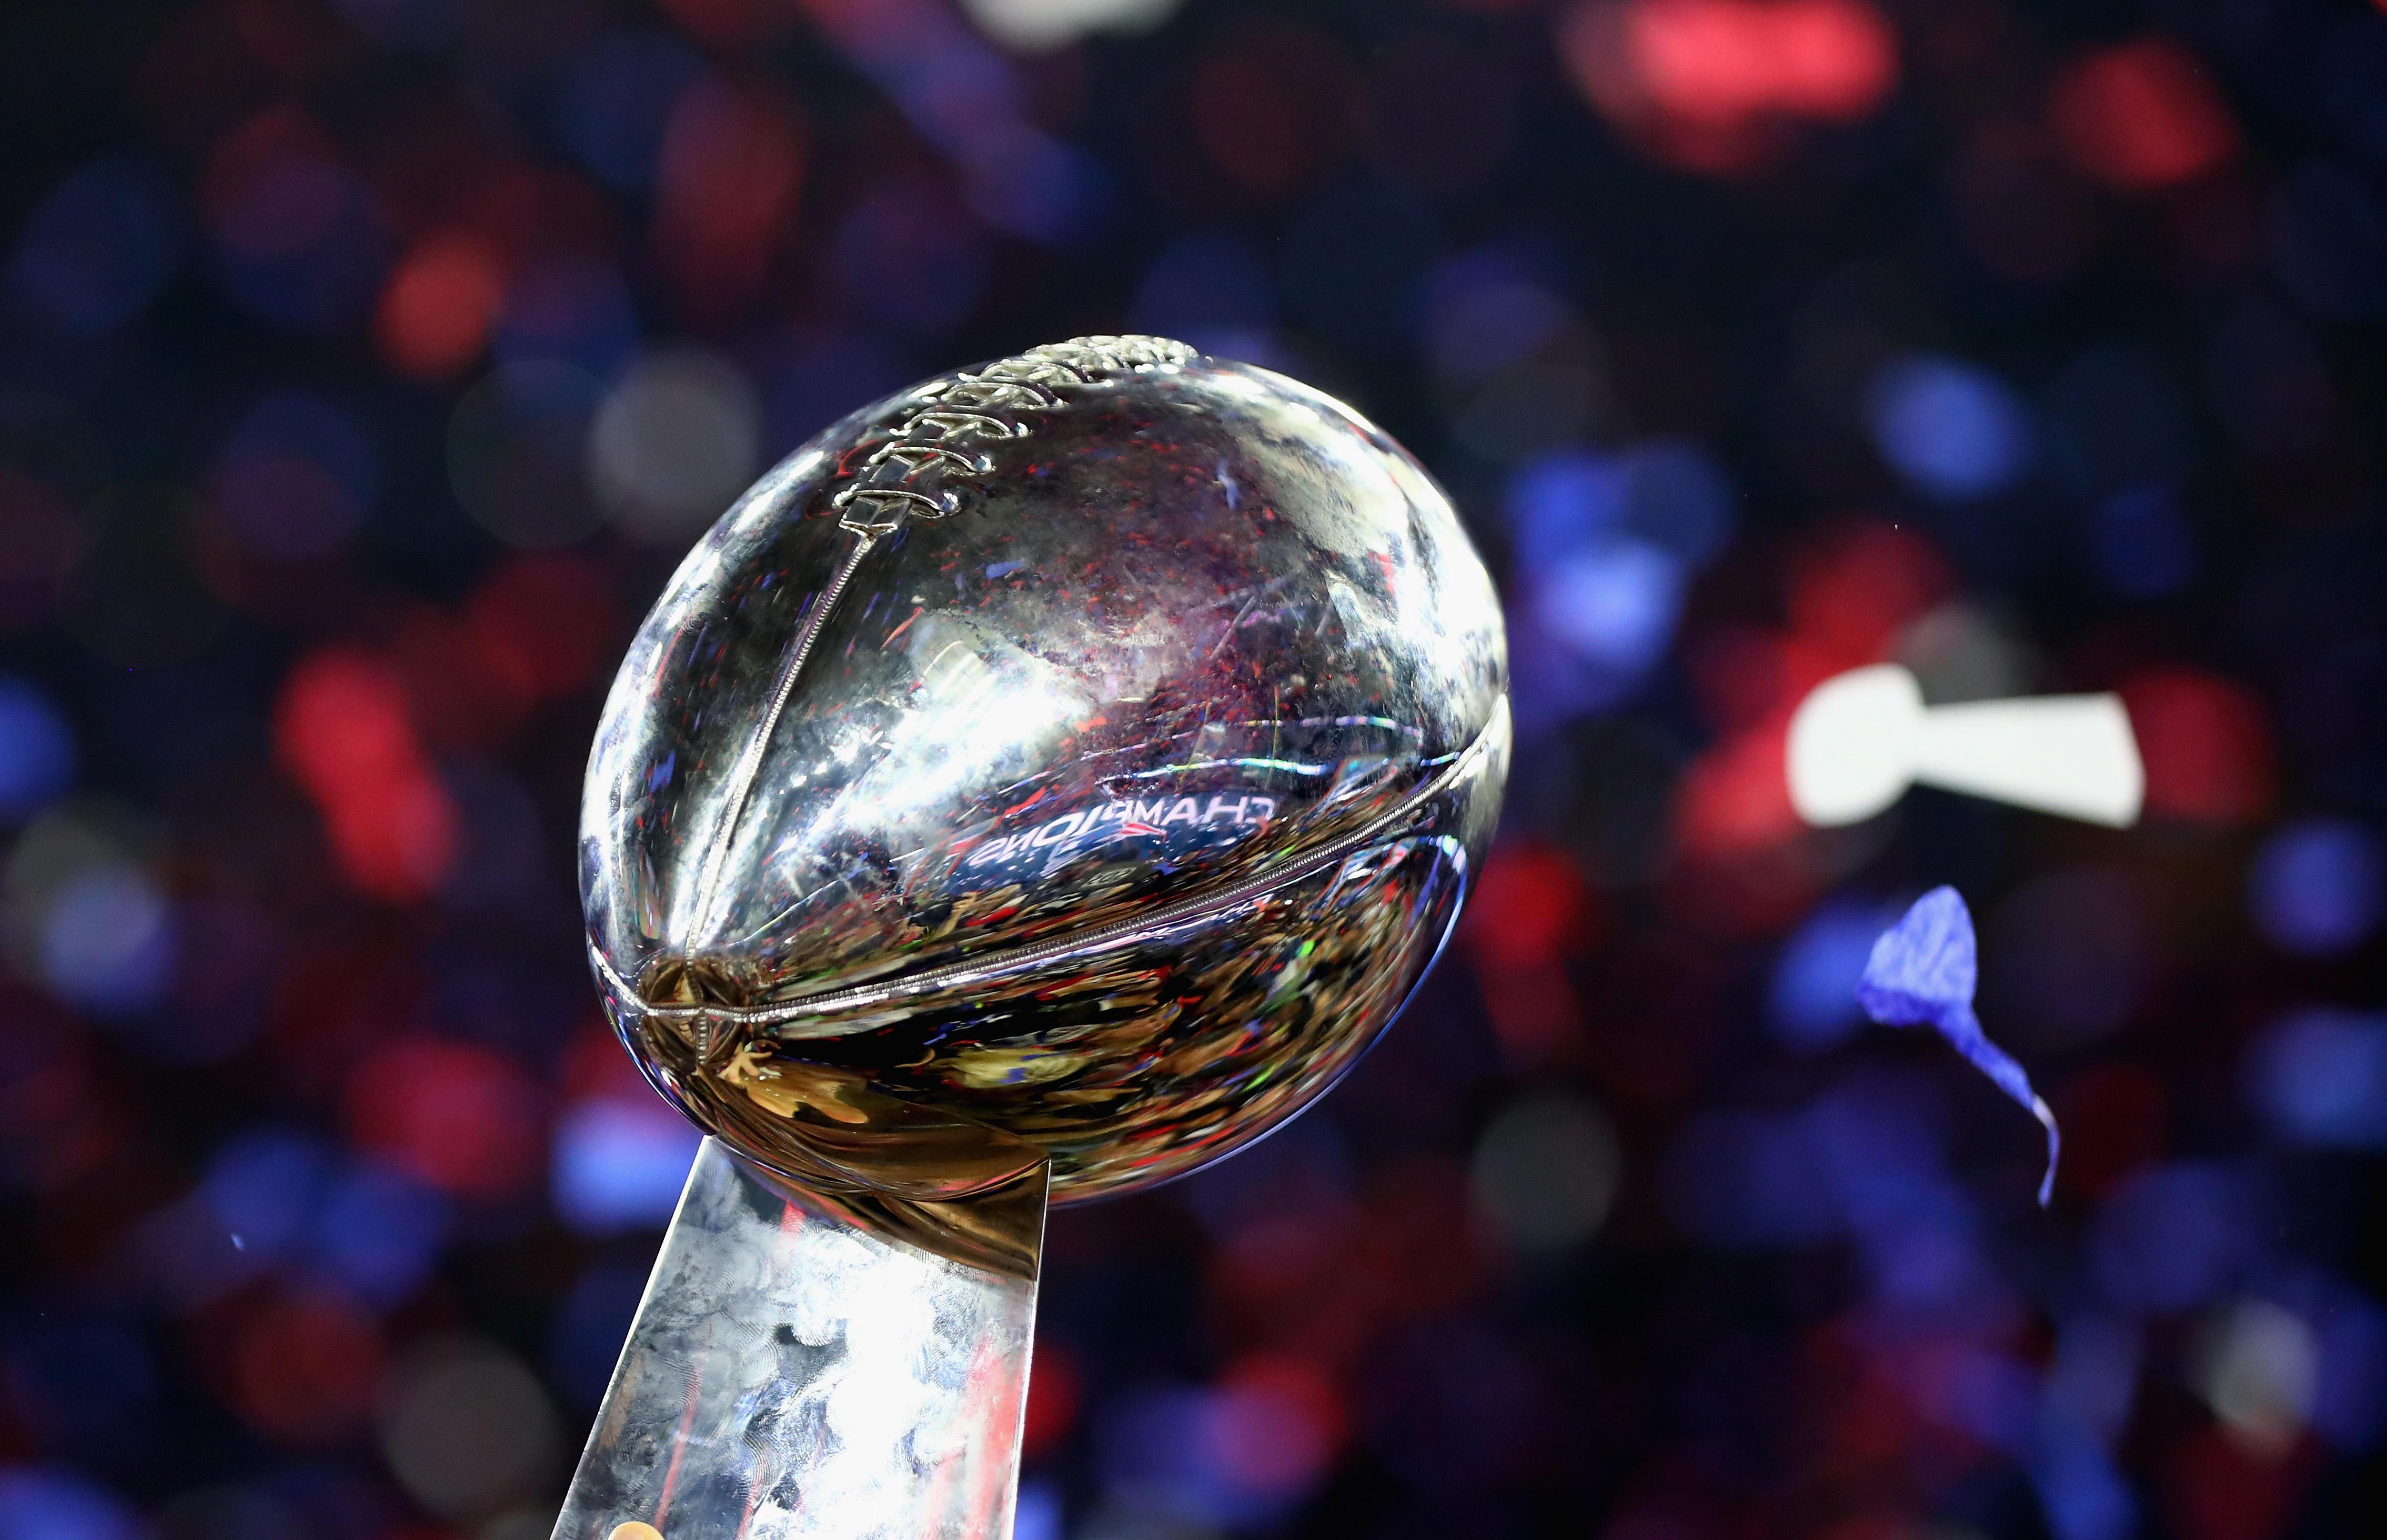 Ergebnis Super Bowl 2021